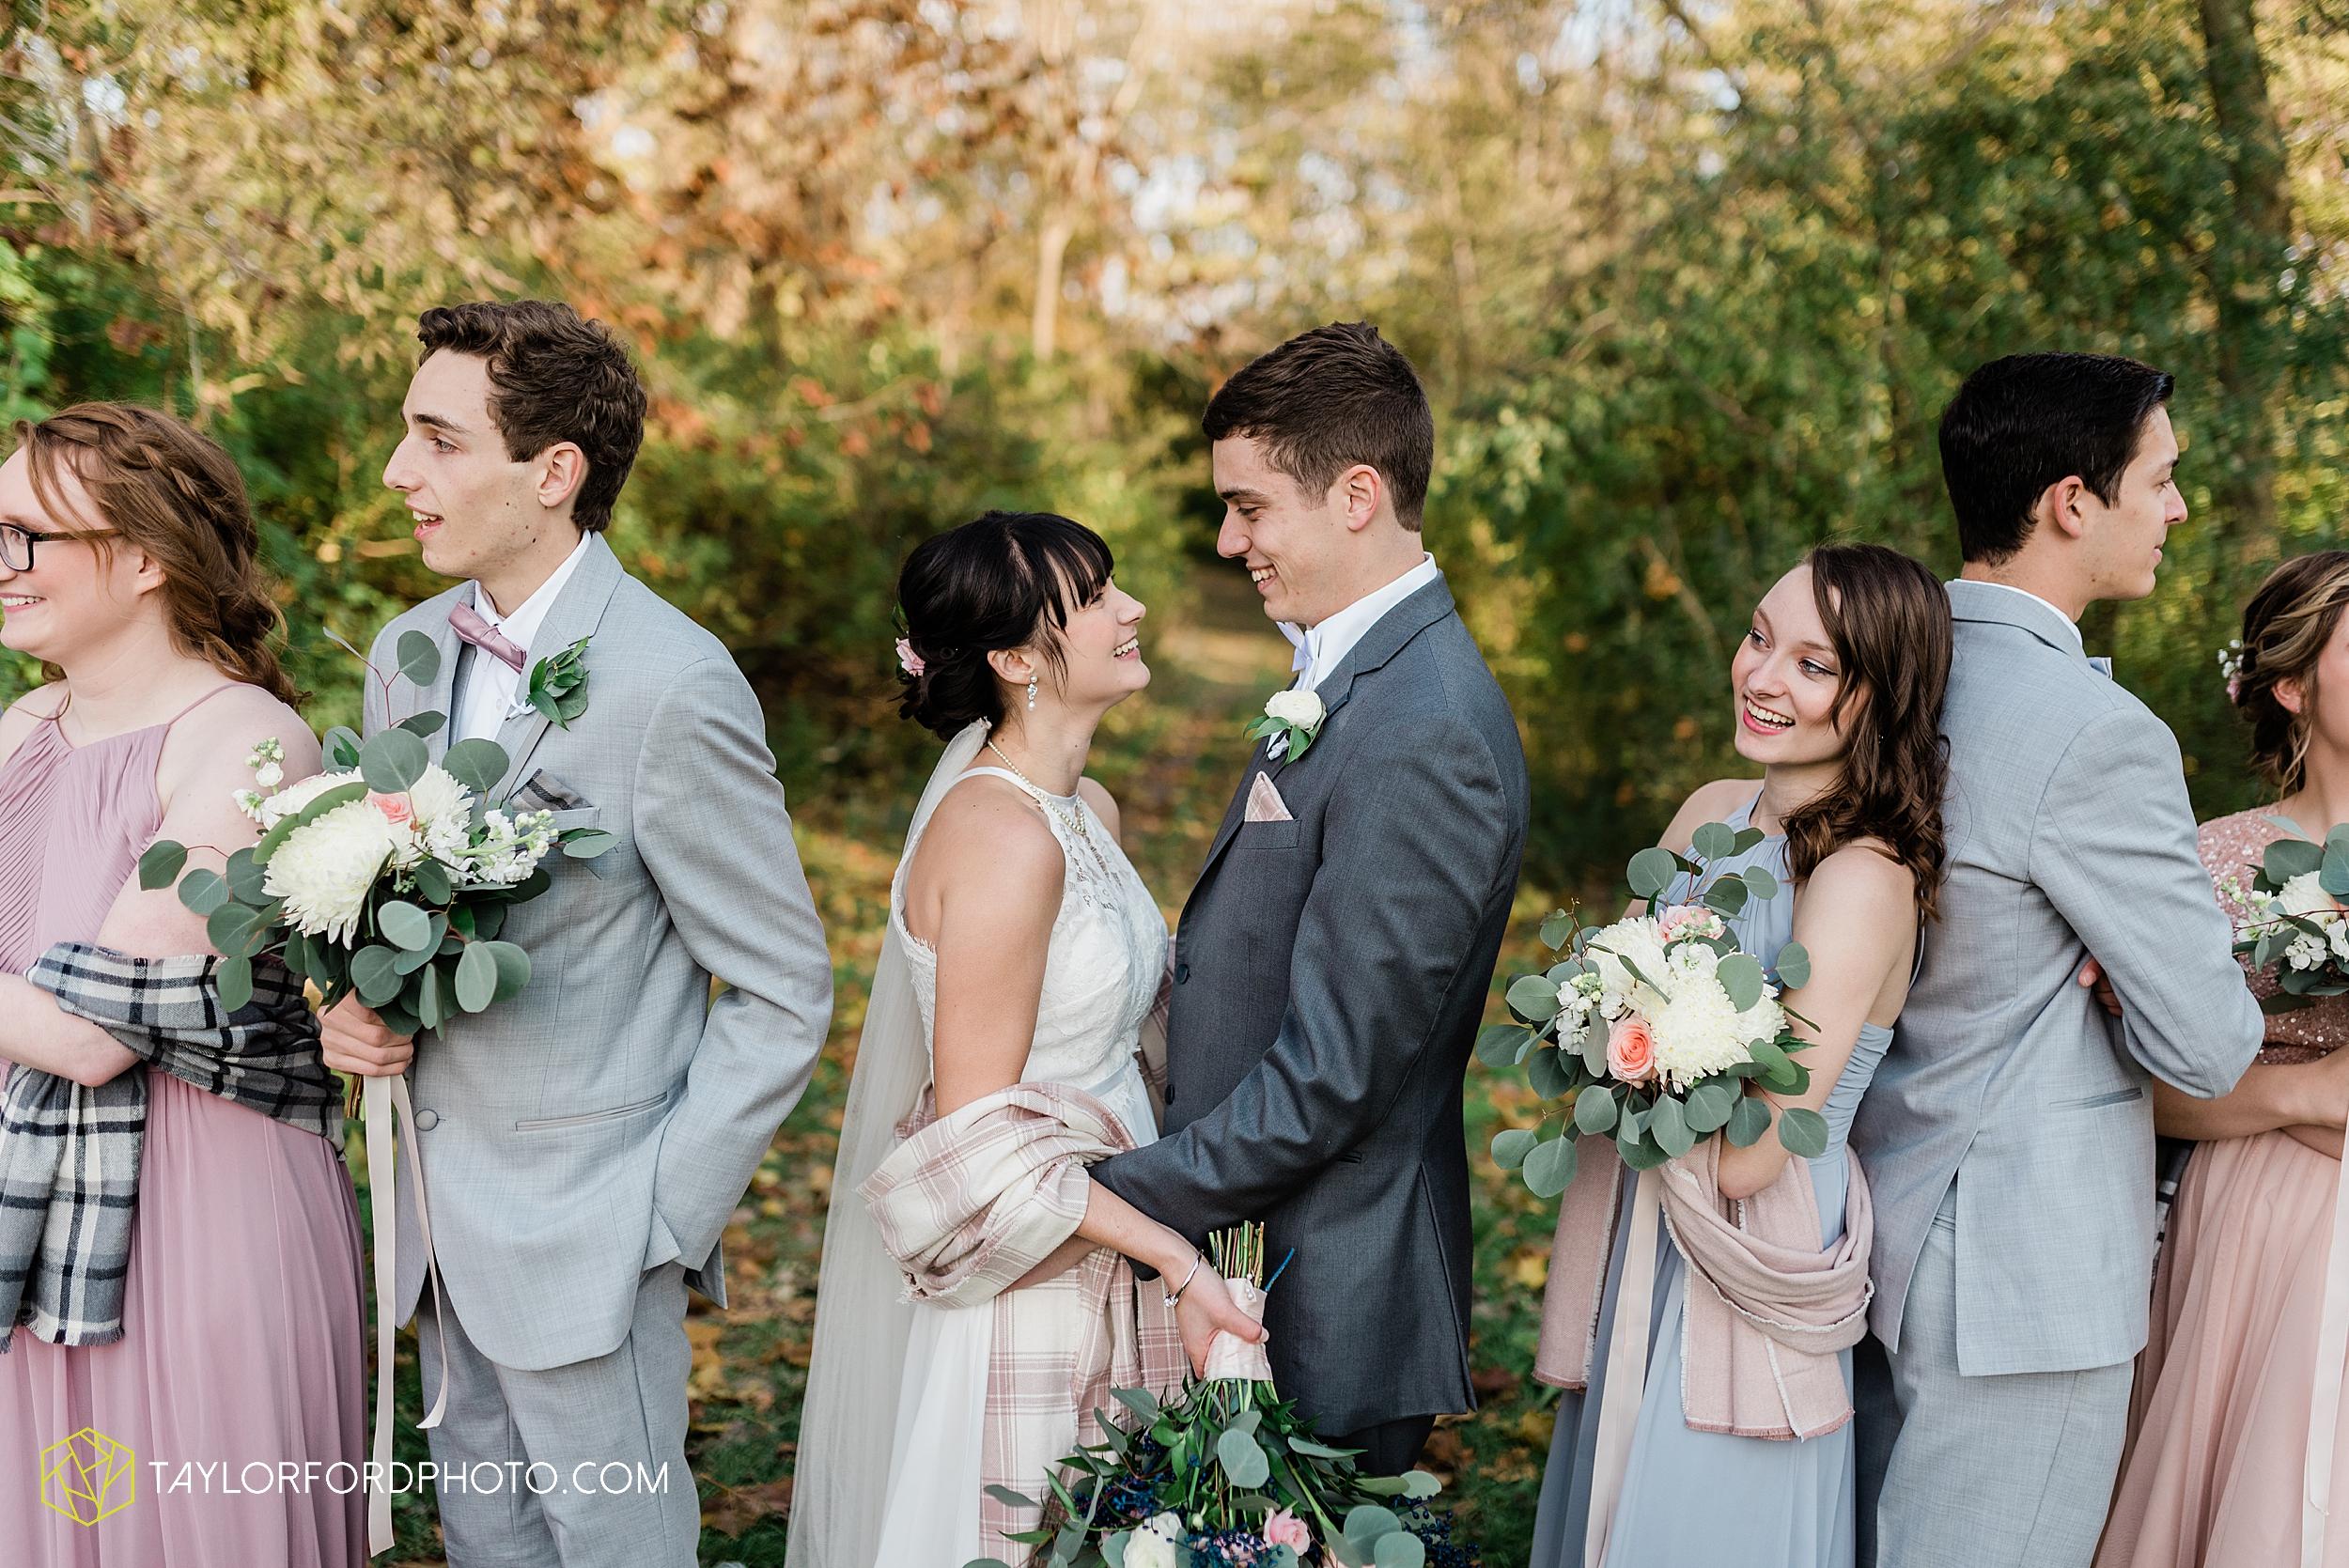 marissa-nicole-nick-daeger-orrmont-estate-farm-wedding-piqua-dayton-troy-ohio-fall-photographer-taylor-ford-photography_1533.jpg